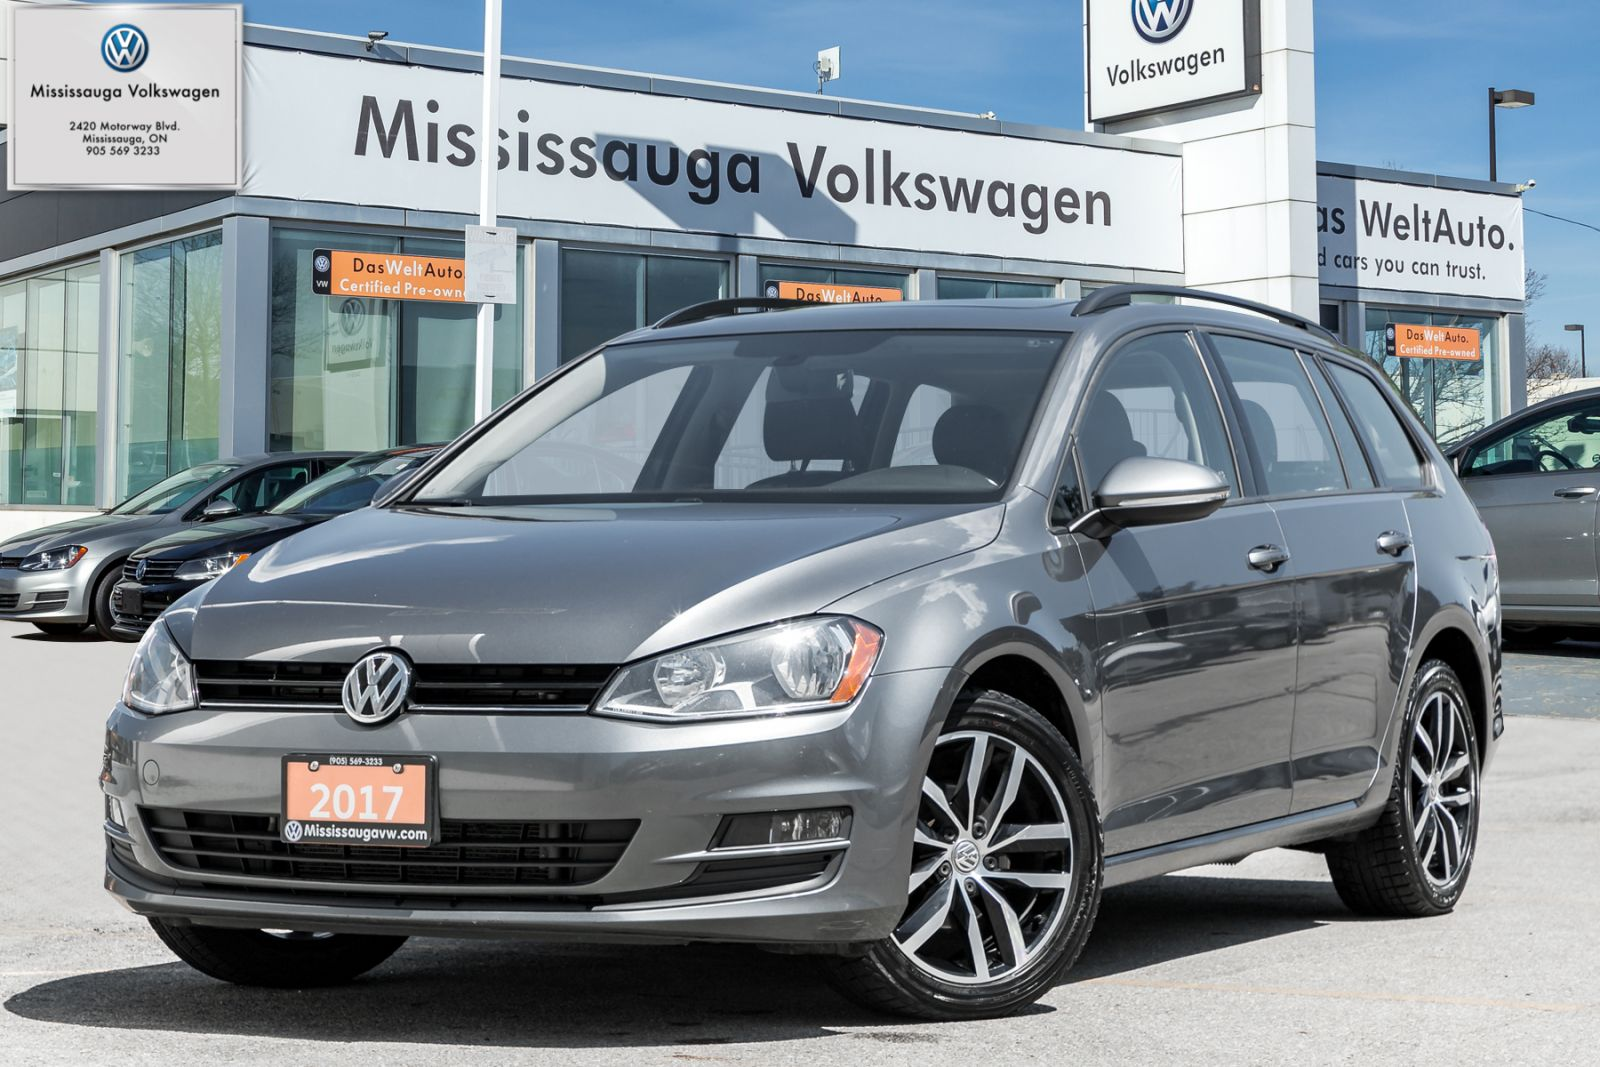 2017 Volkswagen Golf SportWagen 4dr Auto 1.8 TSI Comfortline FWD